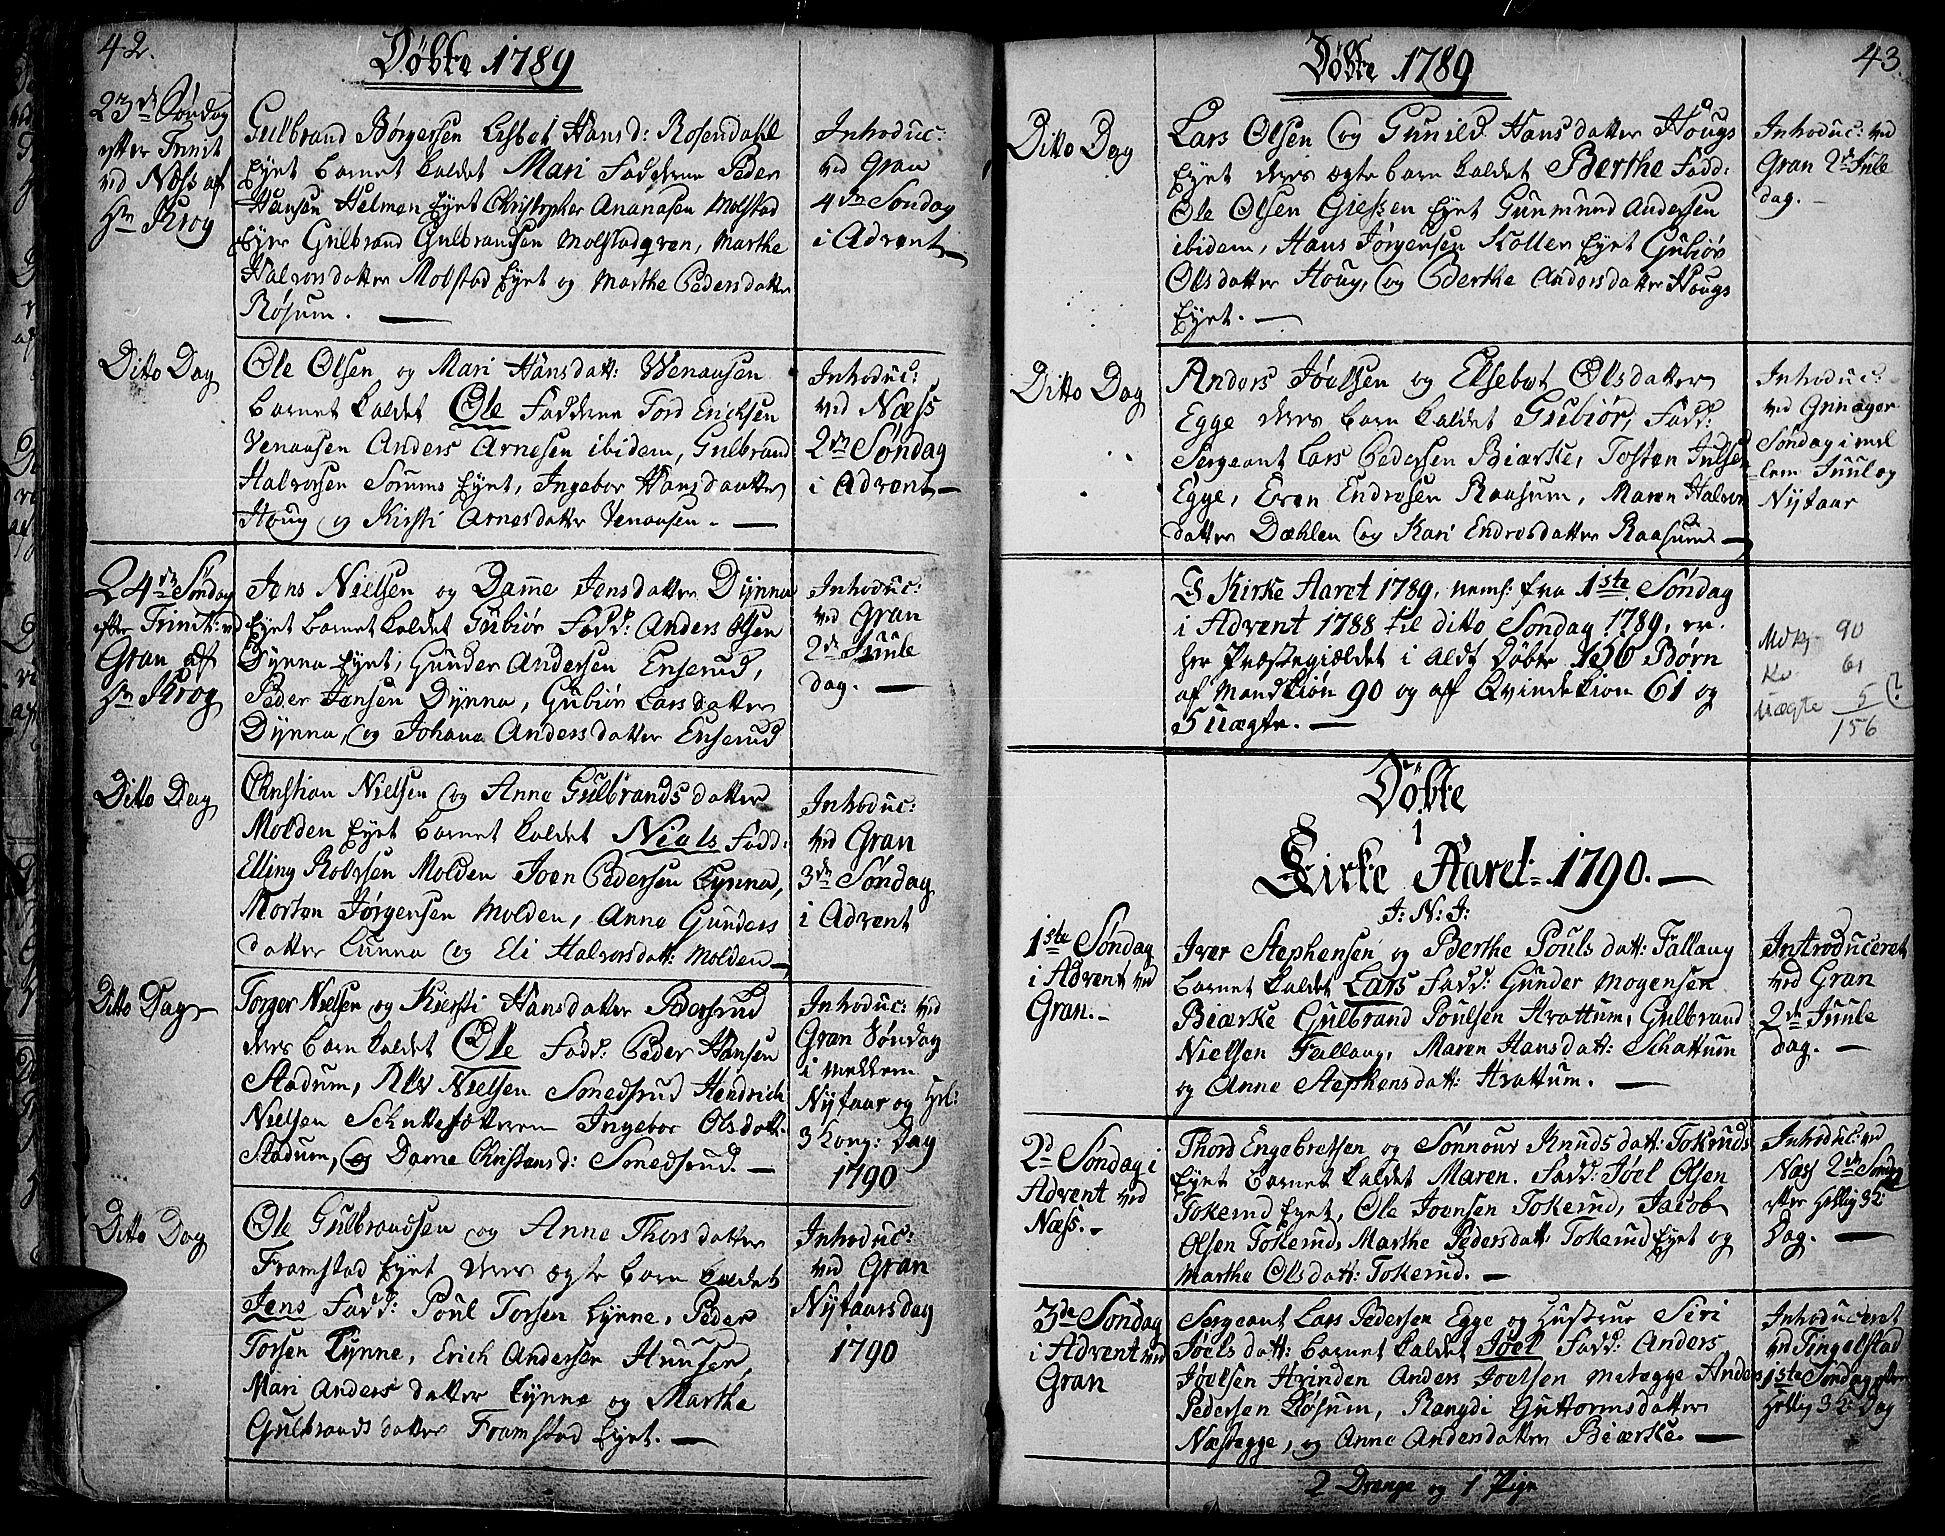 SAH, Gran prestekontor, Ministerialbok nr. 6, 1787-1824, s. 42-43